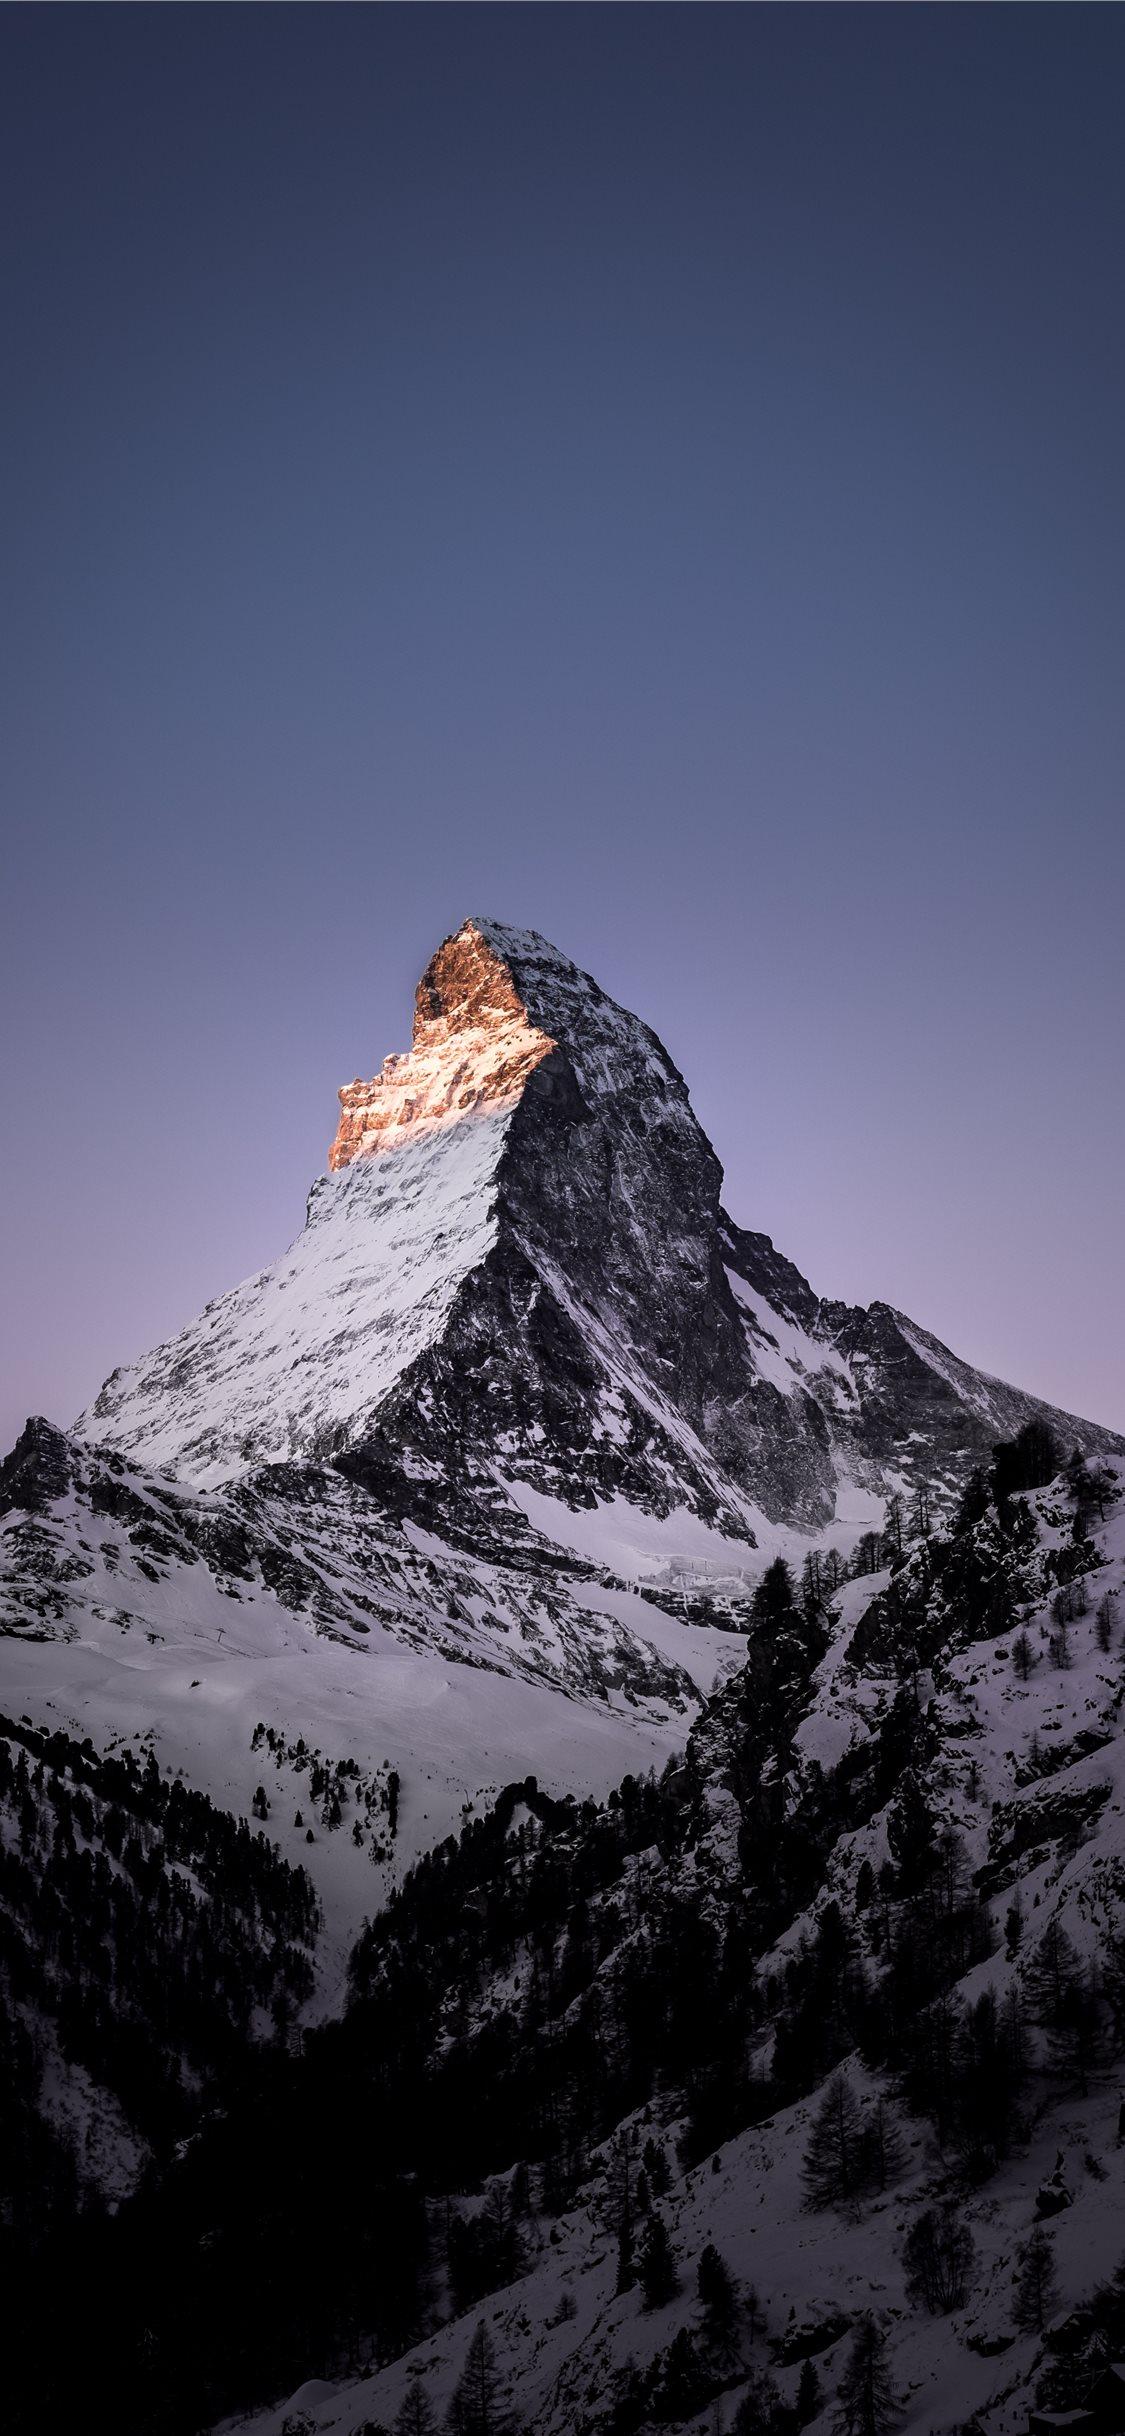 Matterhorn Zermatt Switzerland iPhone X Wallpapers Free ...